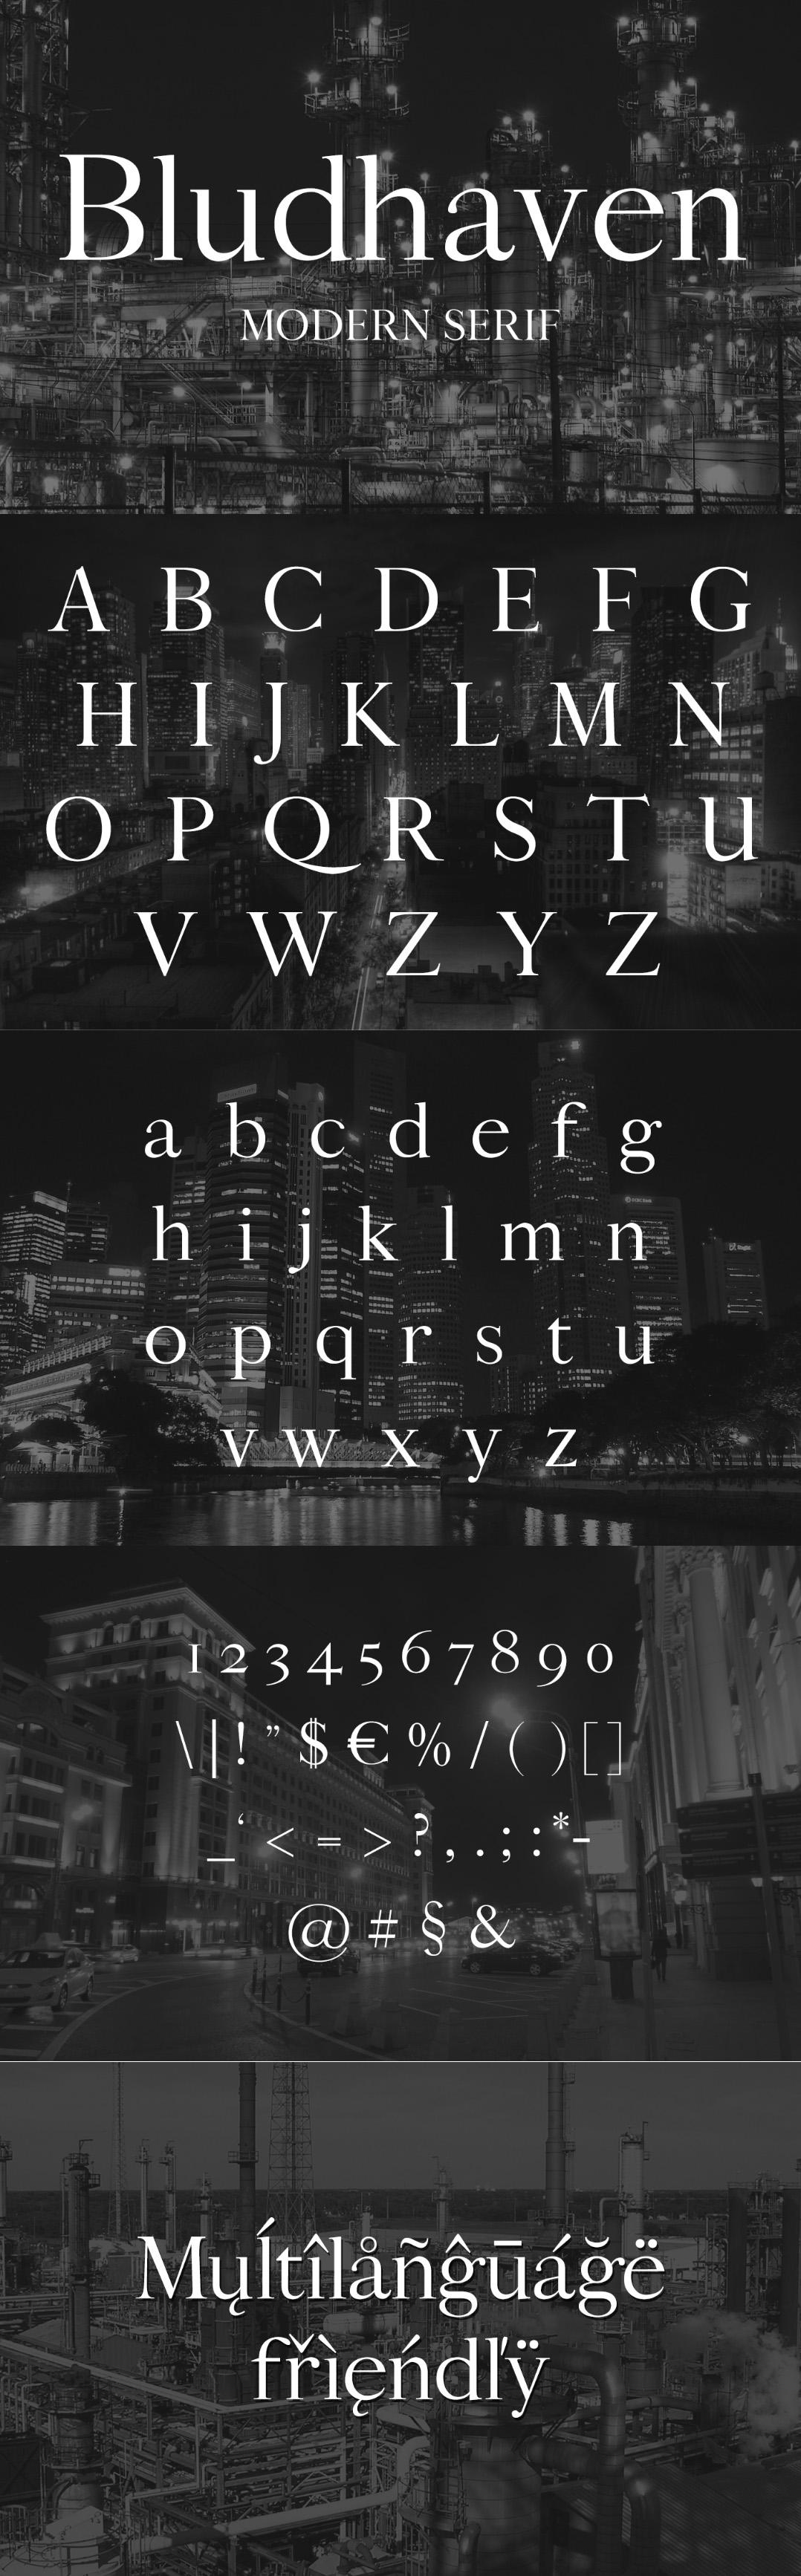 Bludhaven font